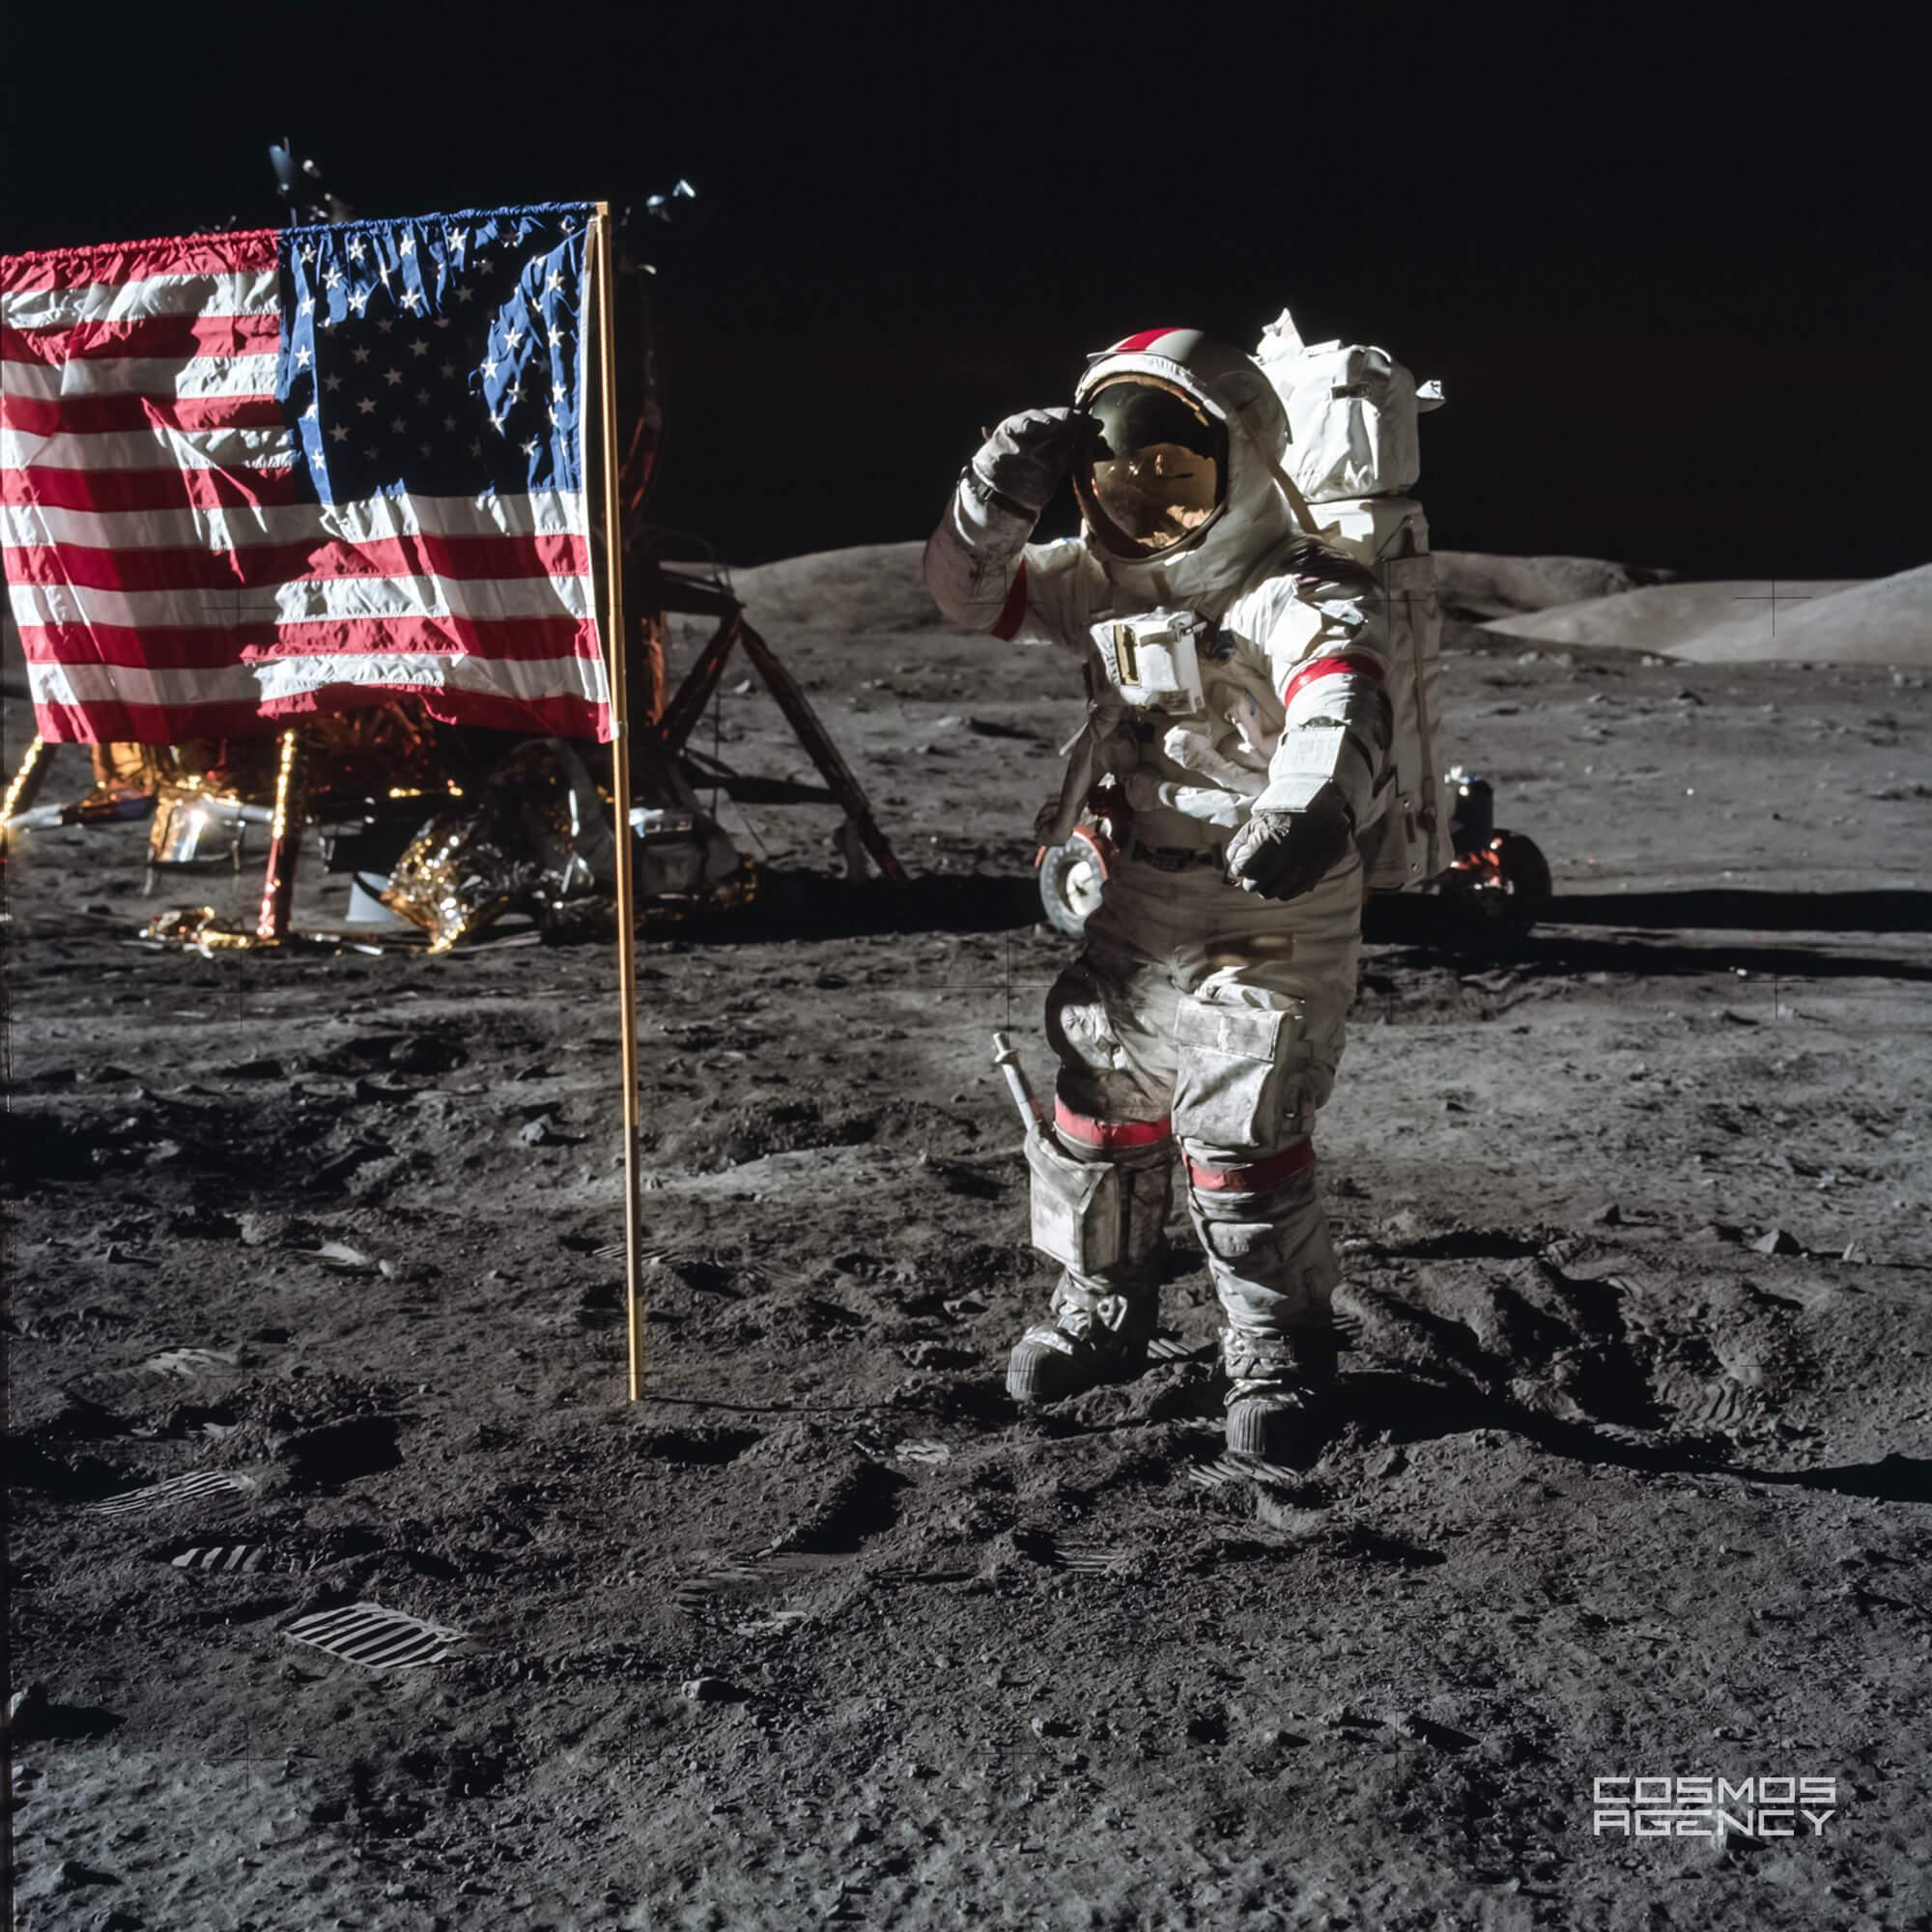 Астронавт NASA Юджин Сернан приветствует американский флаг, Аполлон 17, 1972